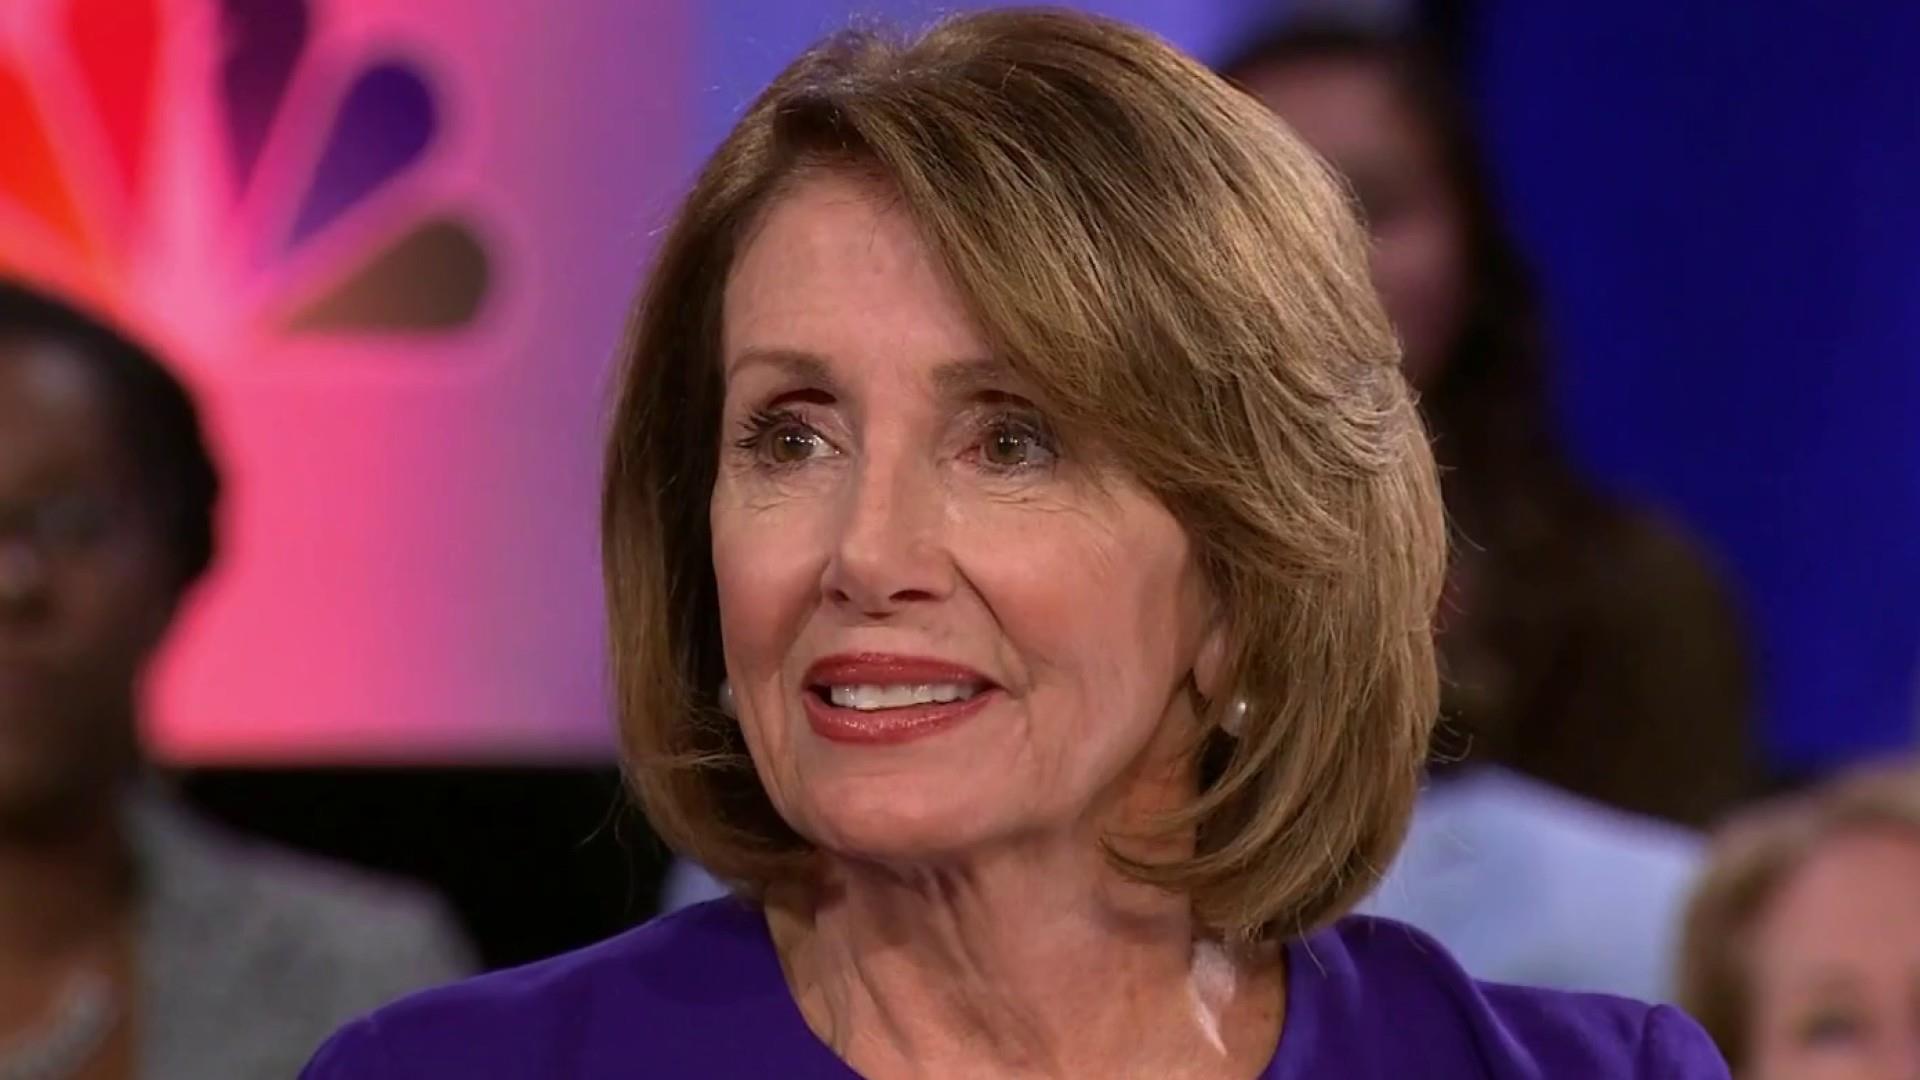 What Nancy Pelosi was like as a Trinity student